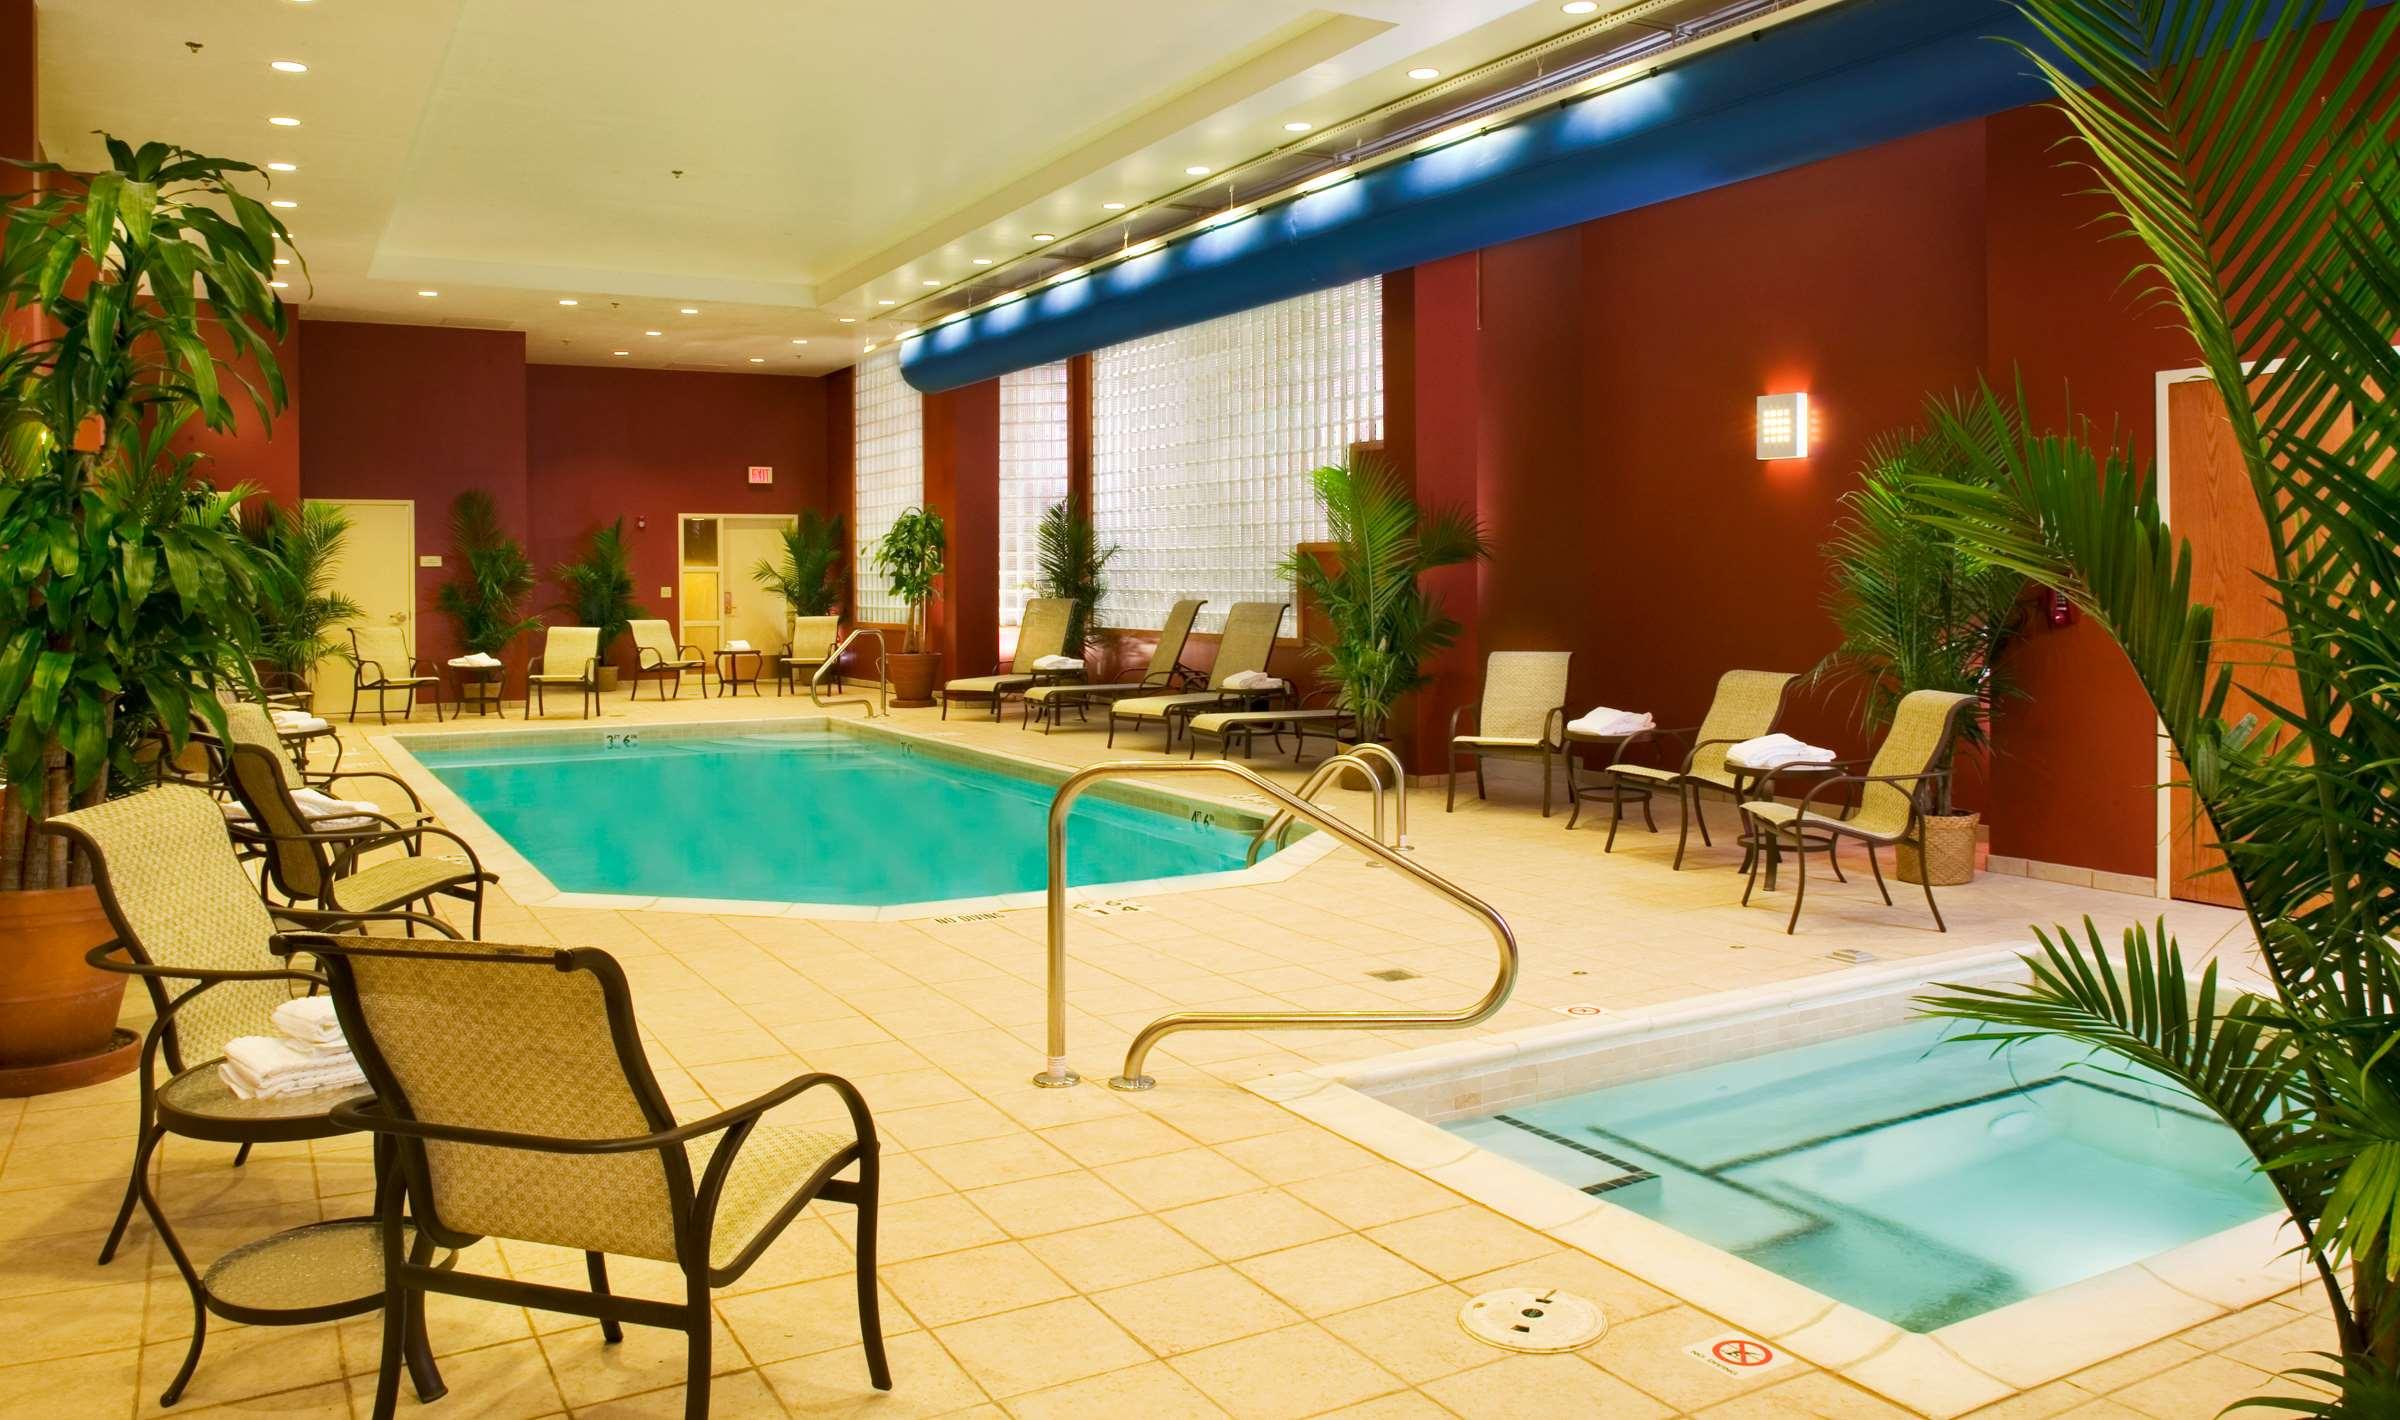 Embassy Suites by Hilton Winston Salem image 6